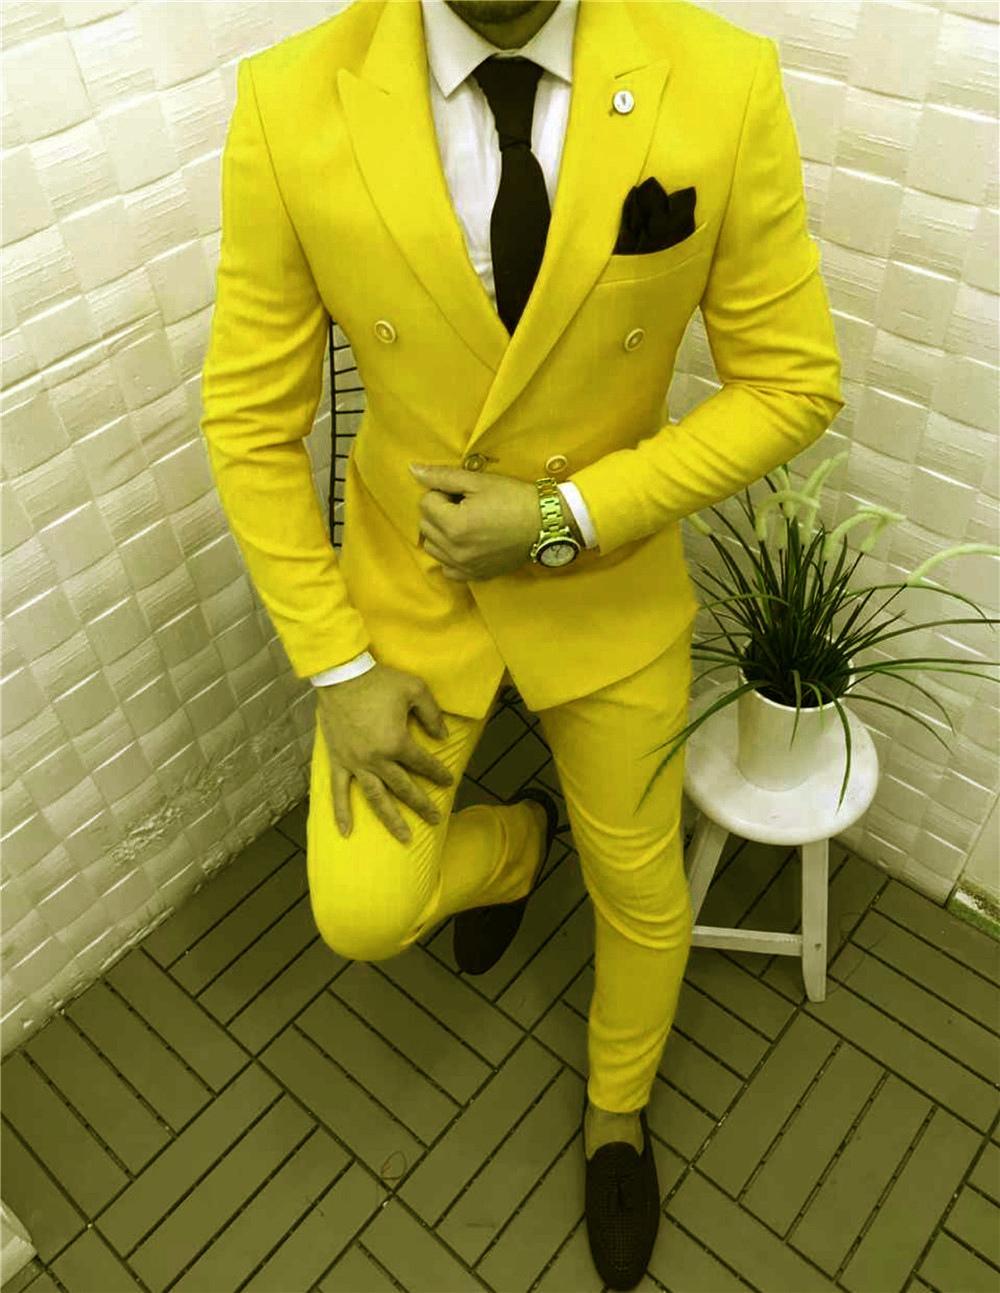 Popular Peak Lapel Groomsmen Double-Breasted Groom Tuxedos Men Suits Wedding/Prom Best Man Blazer ( Jacket+Pantst+Tie) Y08